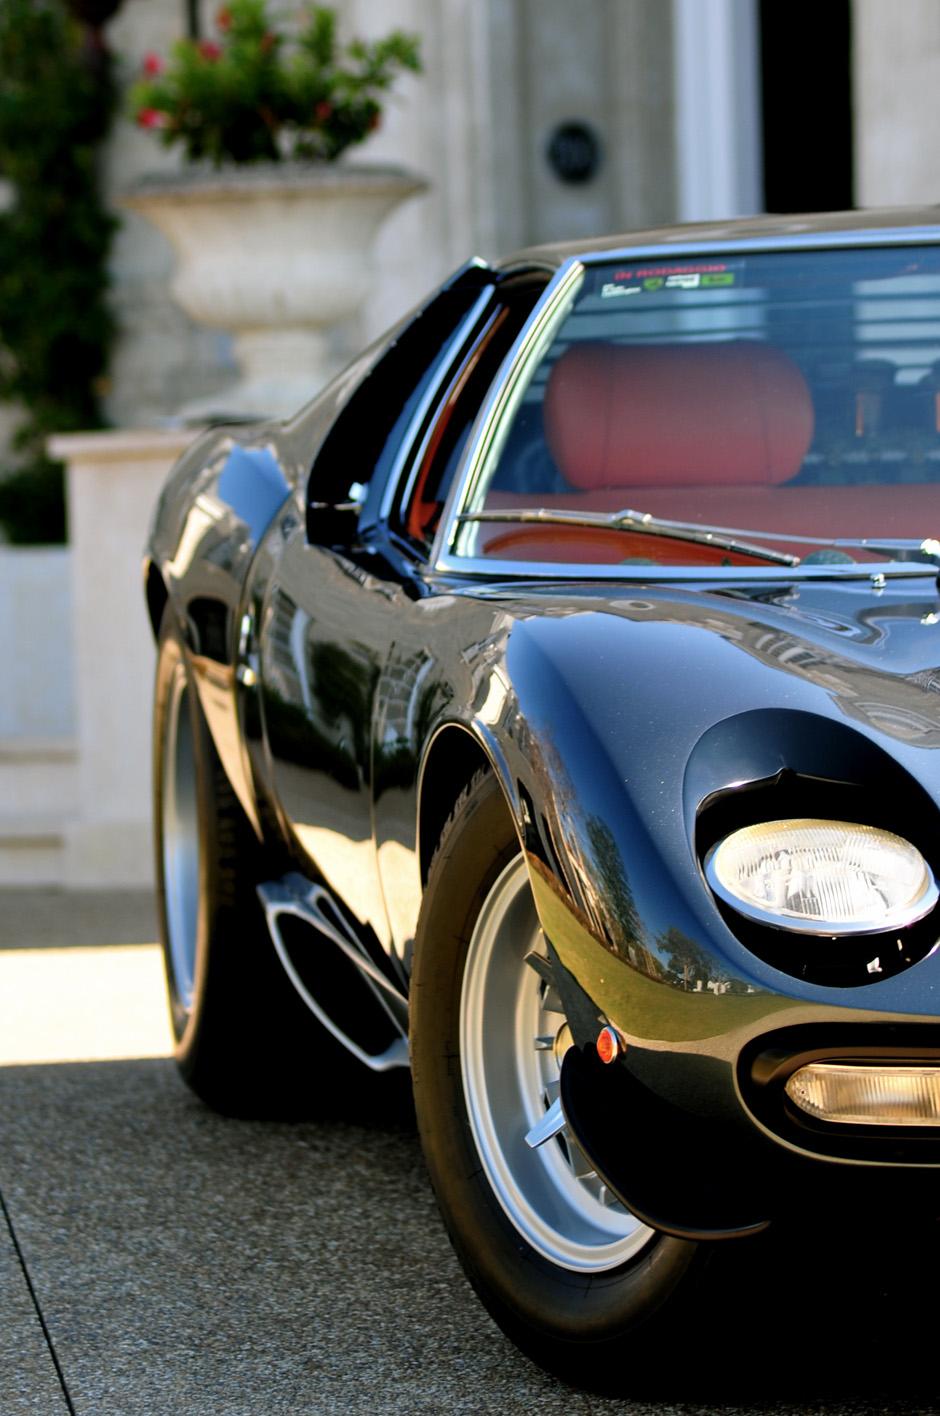 miura lamborghini black sportscar classic drive wheel vintage street chrome fast